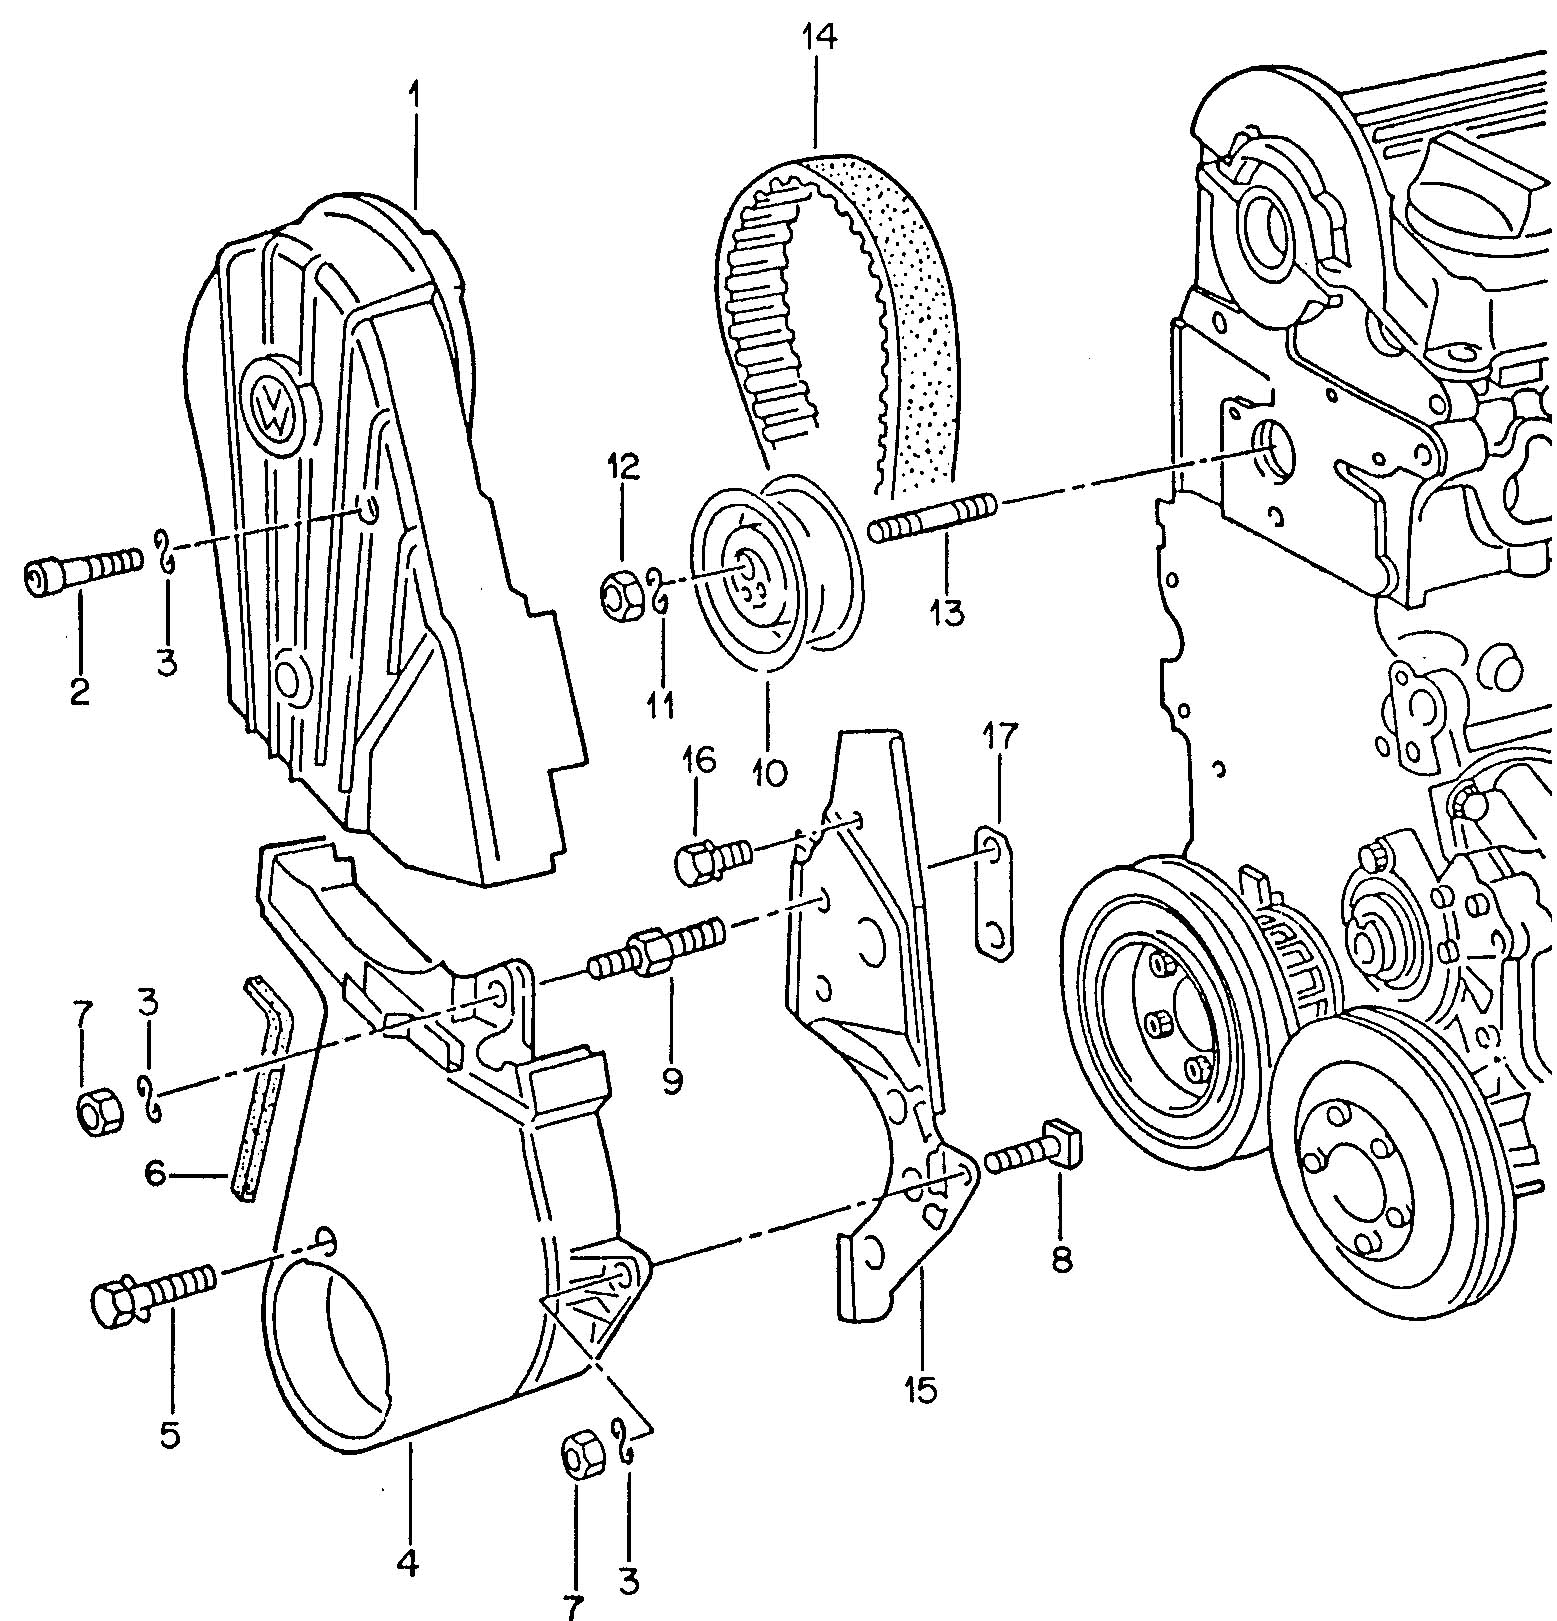 Buick Riviera Repair Manual